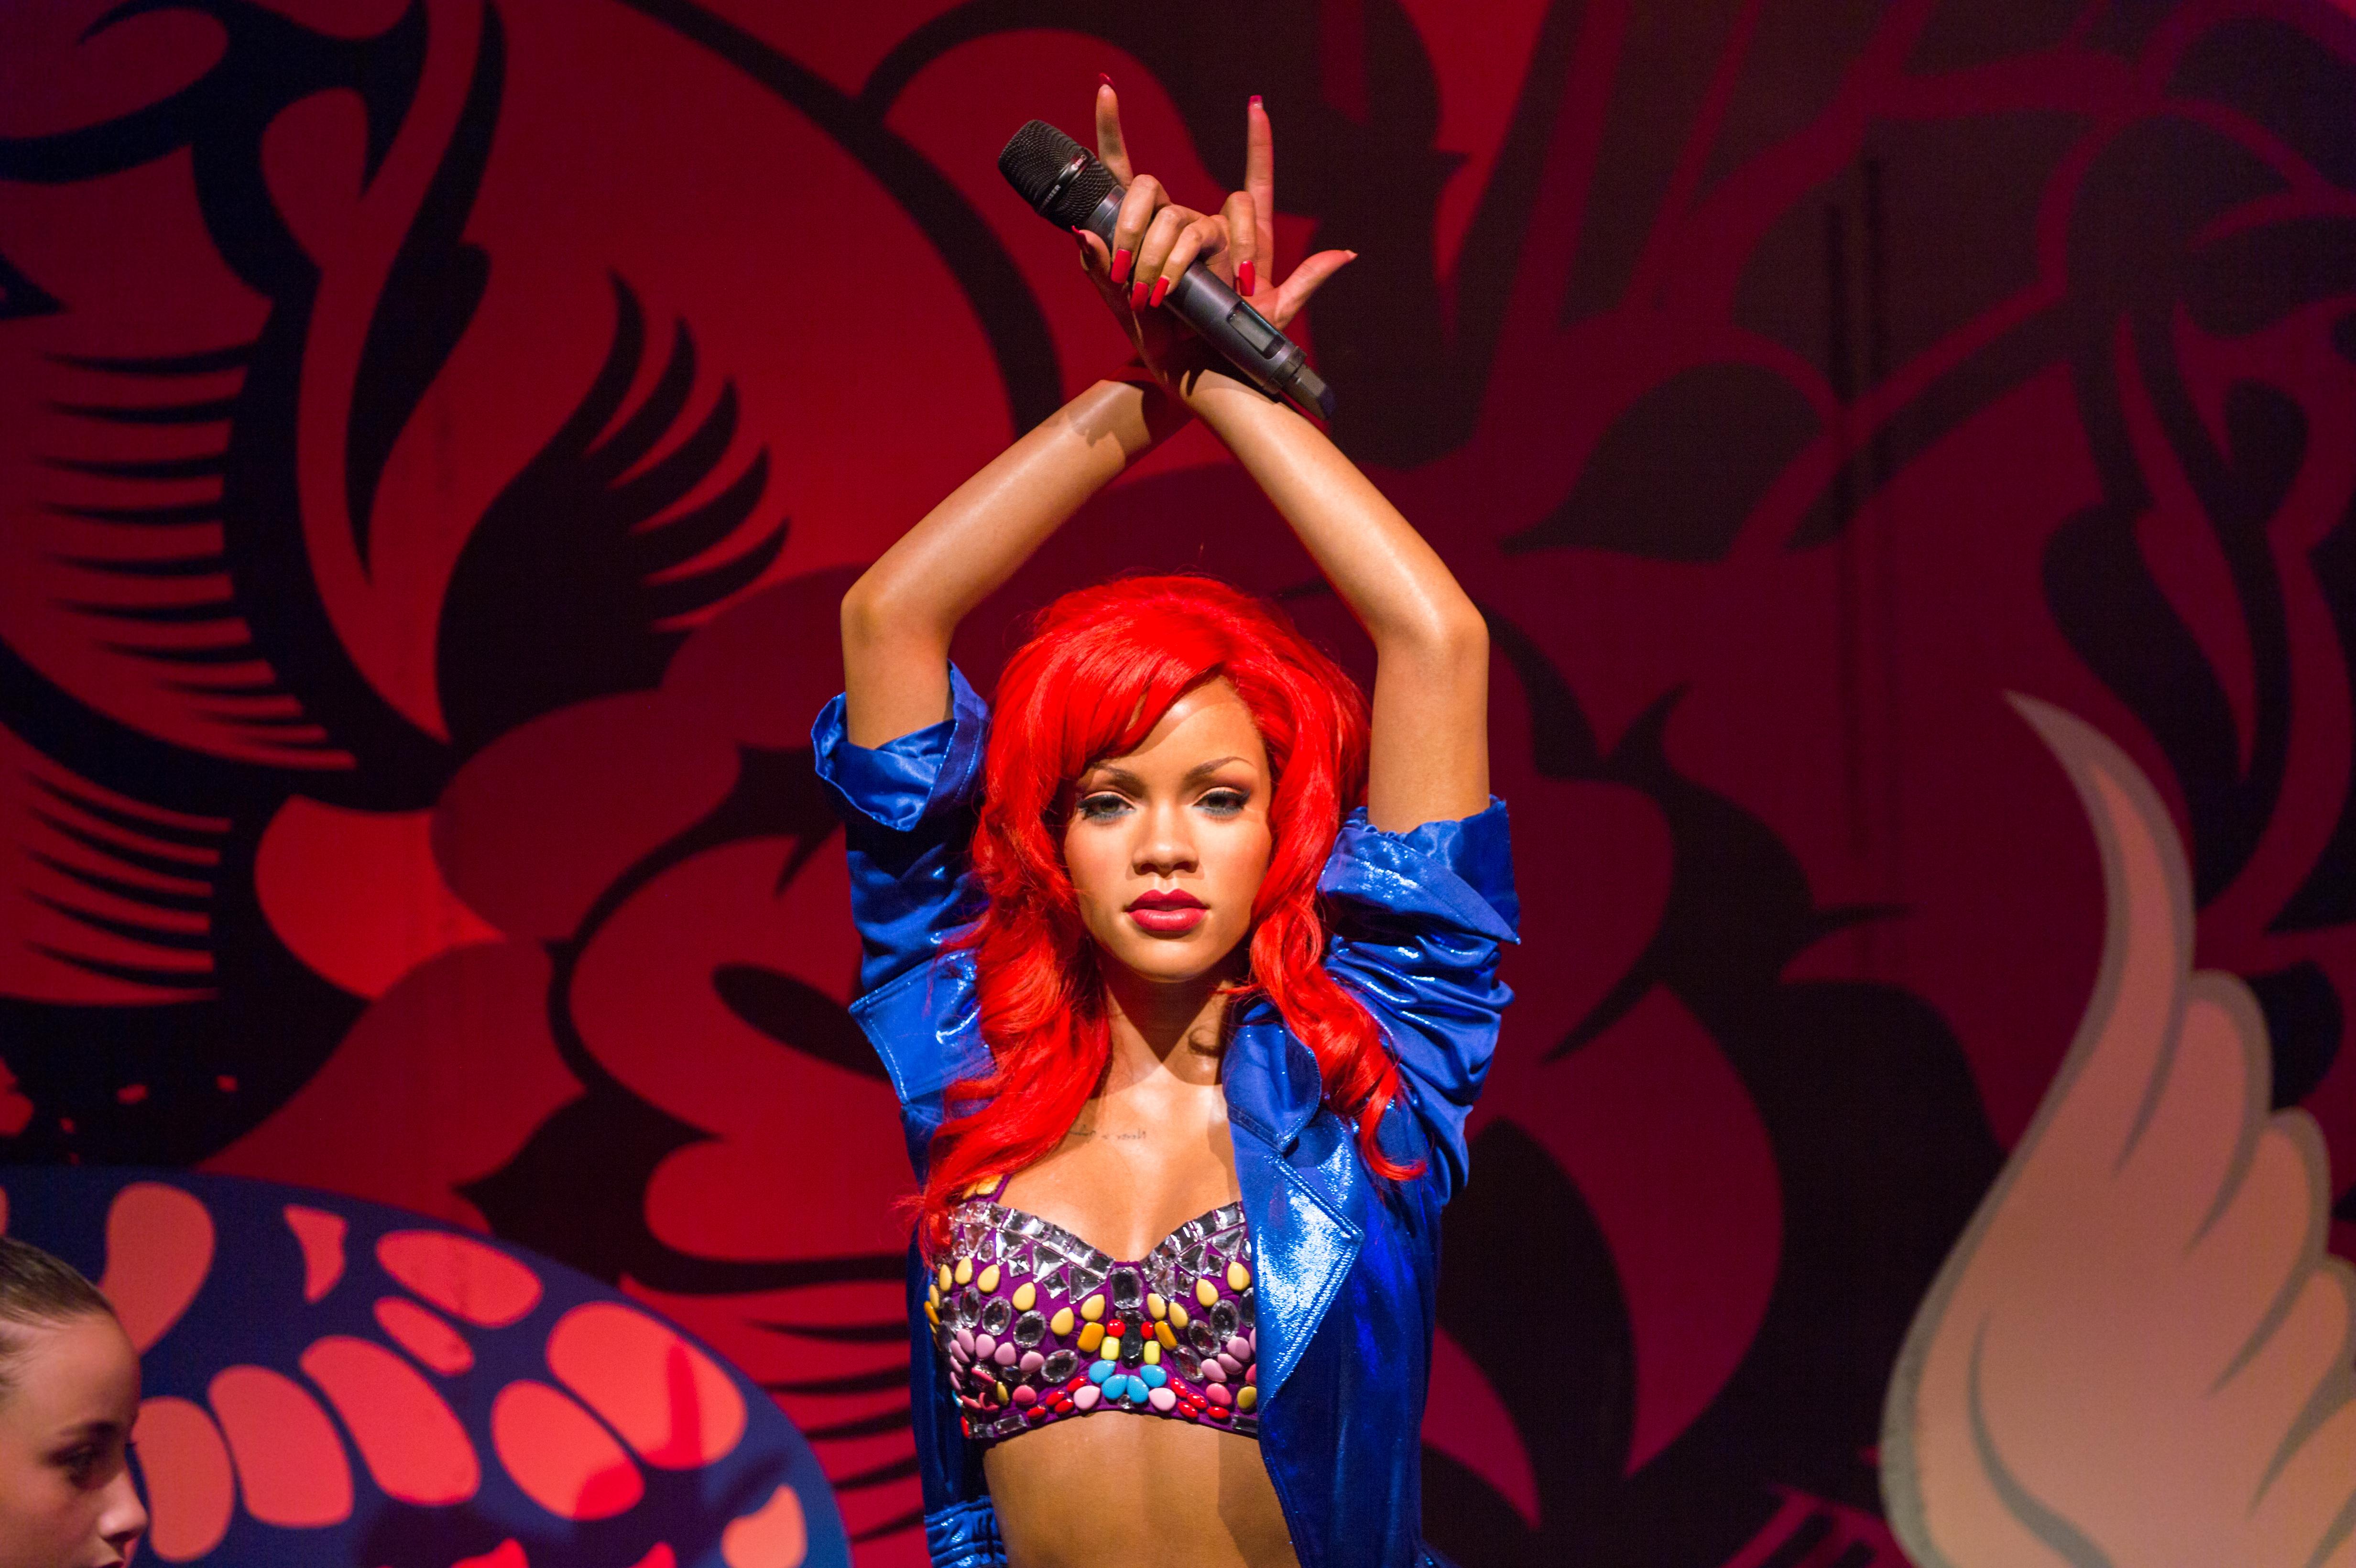 Wearing Rihanna's New Makeup Line Won't Make You As Cool As Rihanna